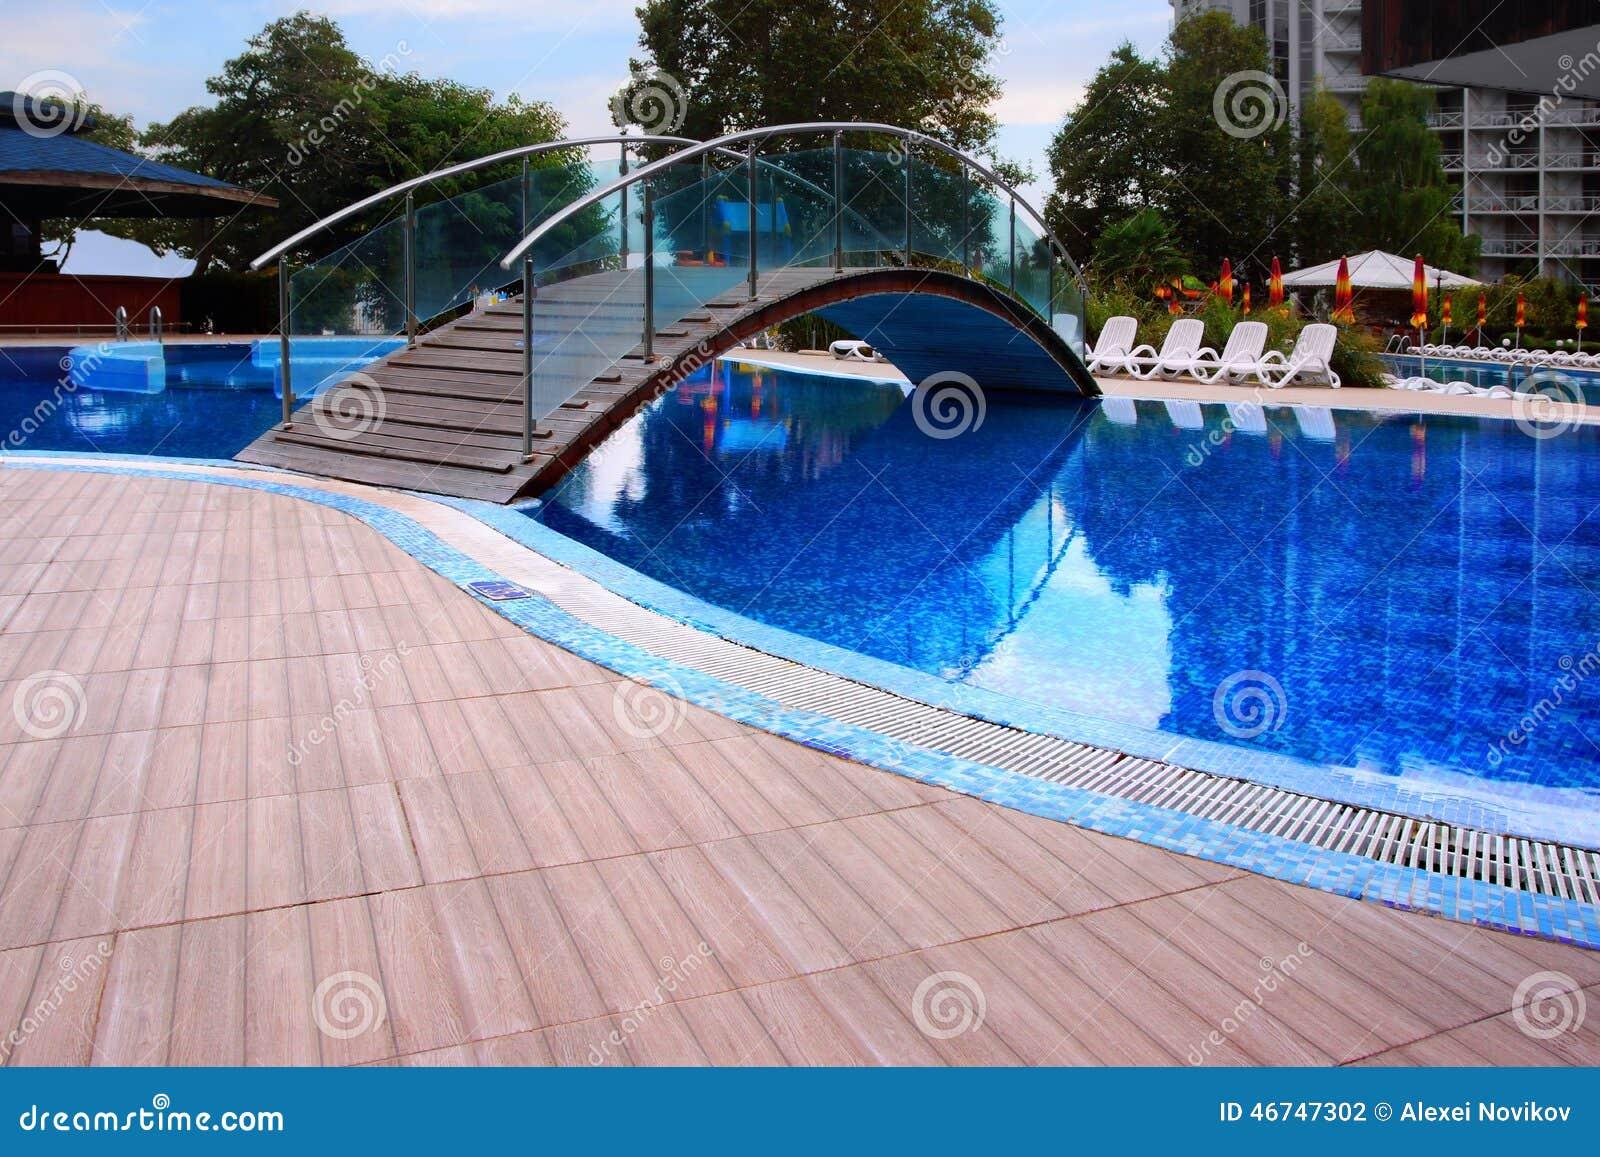 Swimming Pool With Bridge Stock Photo